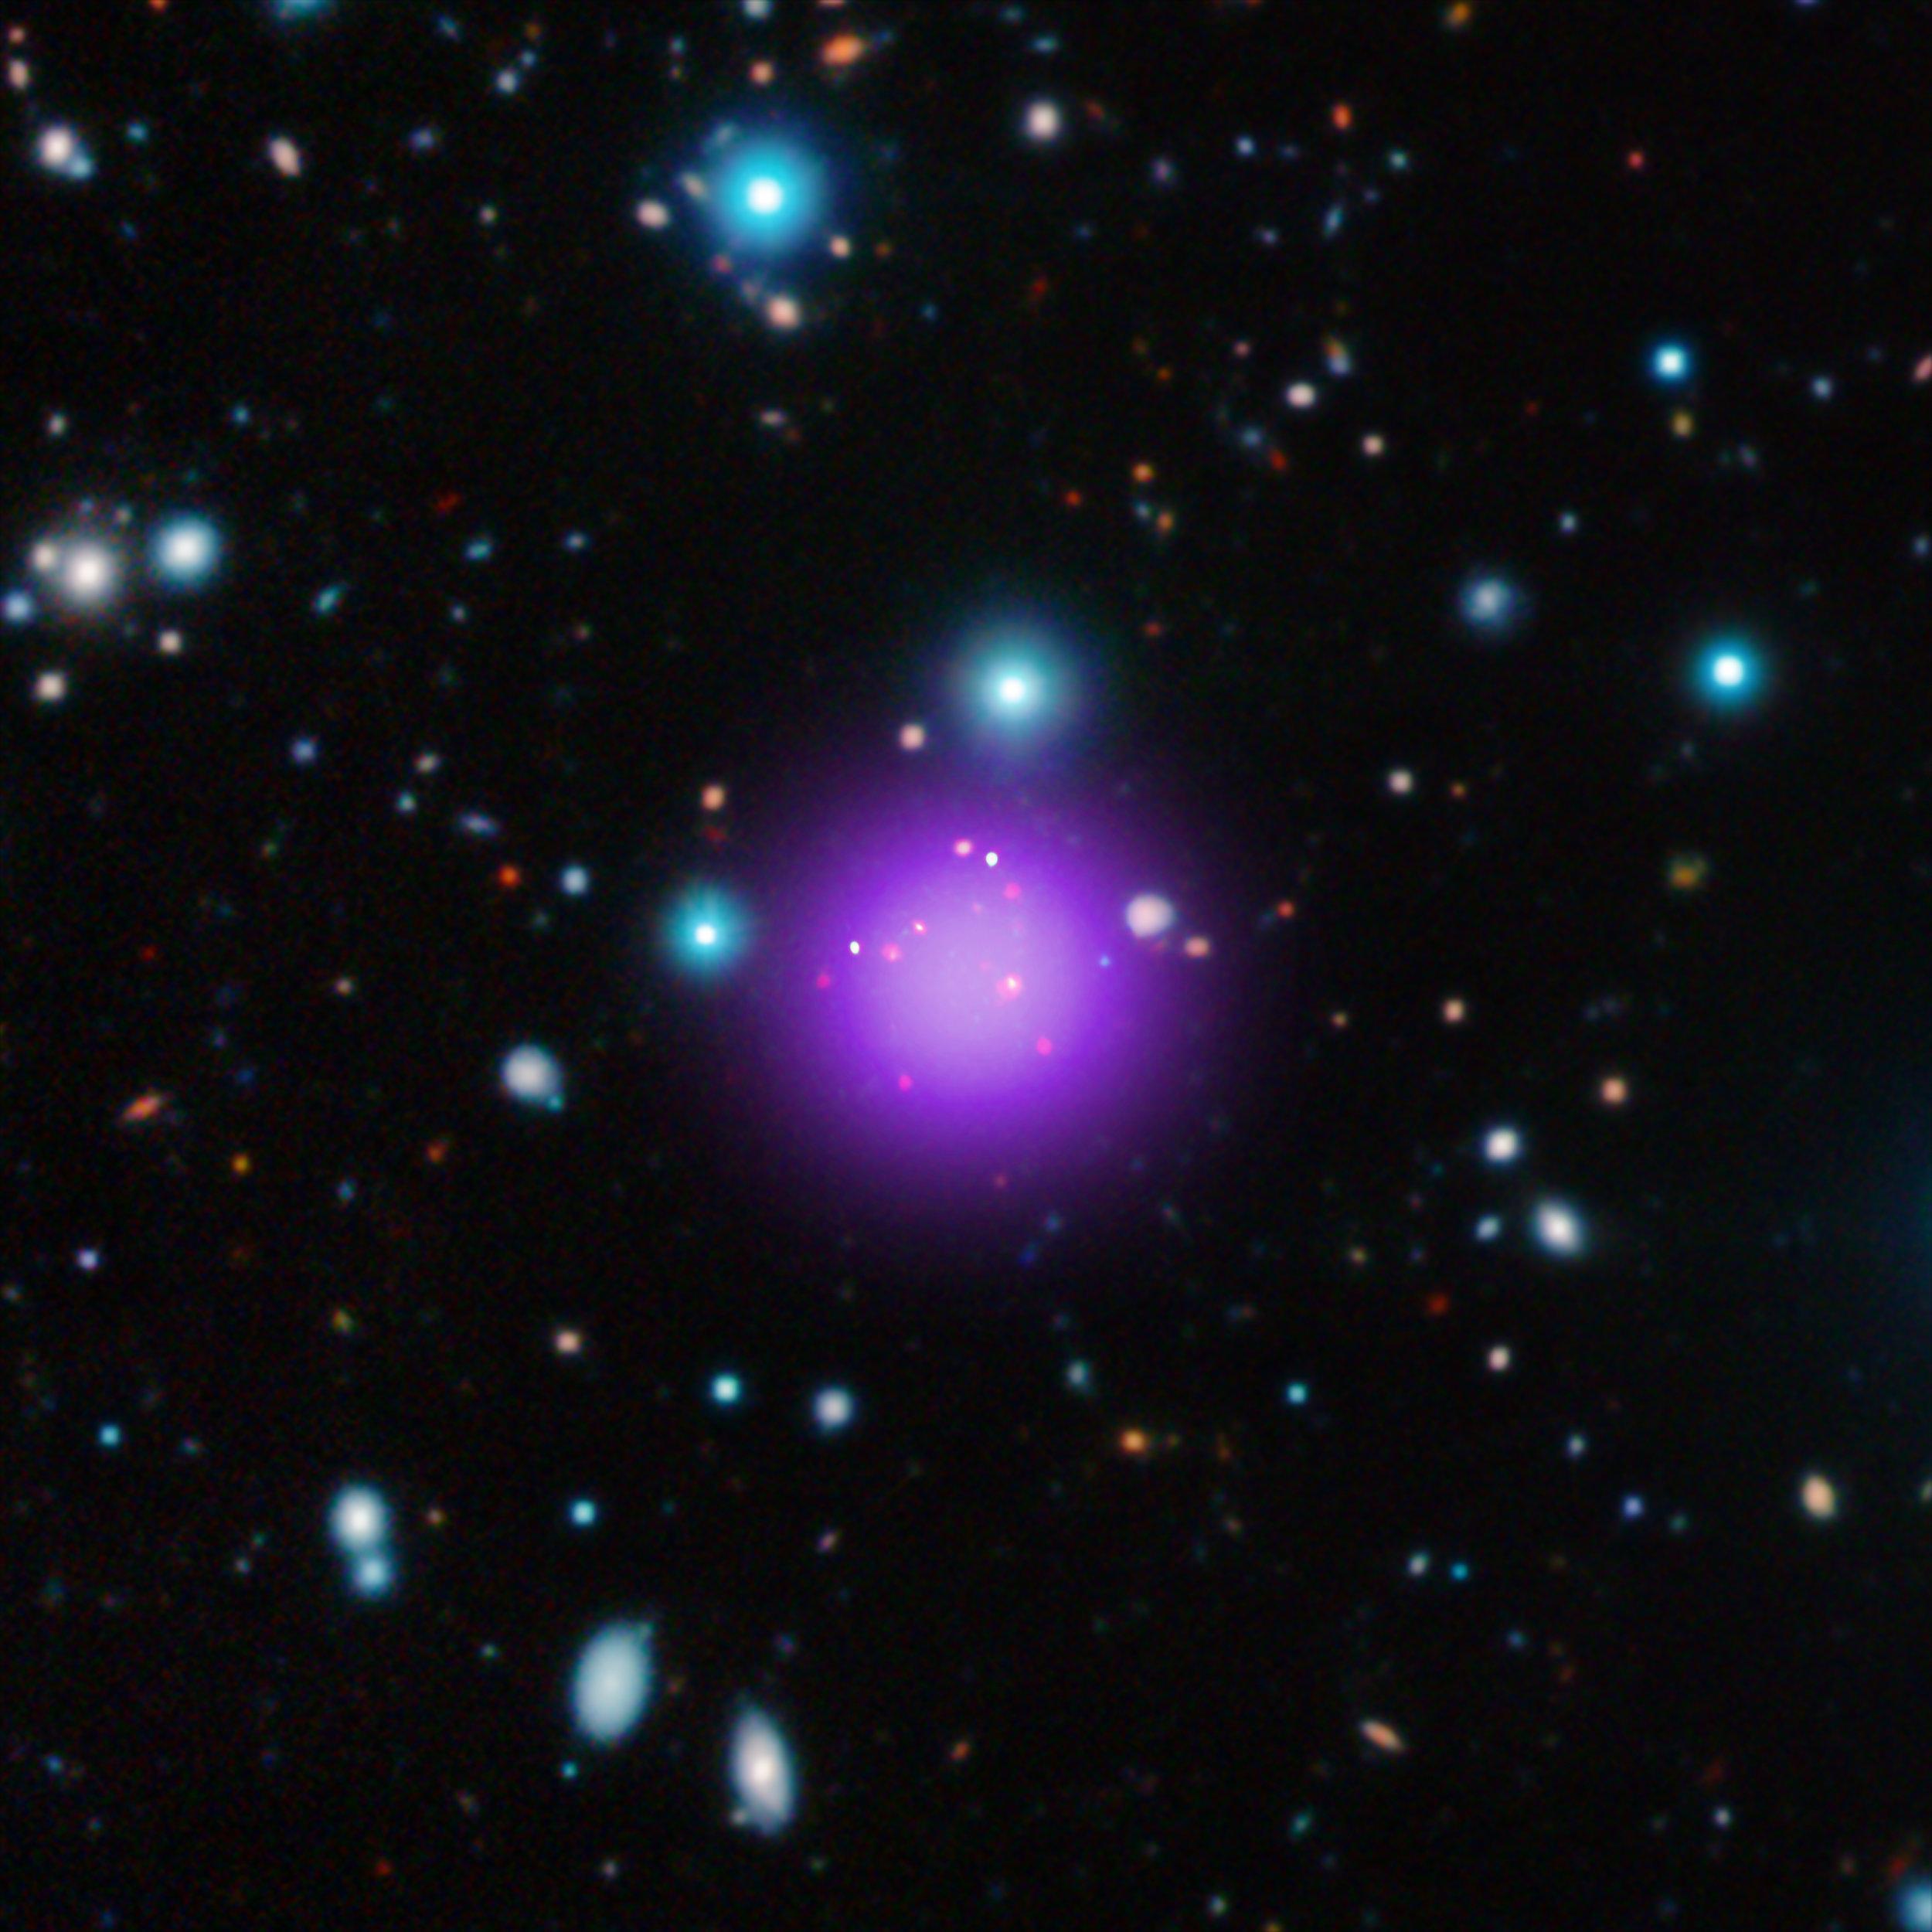 Galaxy Cluster CL J1001+0220 - Image   Credits: X-ray: NASA/CXC/CEA/T. Wang et al; Infrared: ESO/UltraVISTA; Radio: ESO/NAOJ/NRAO/ALMA